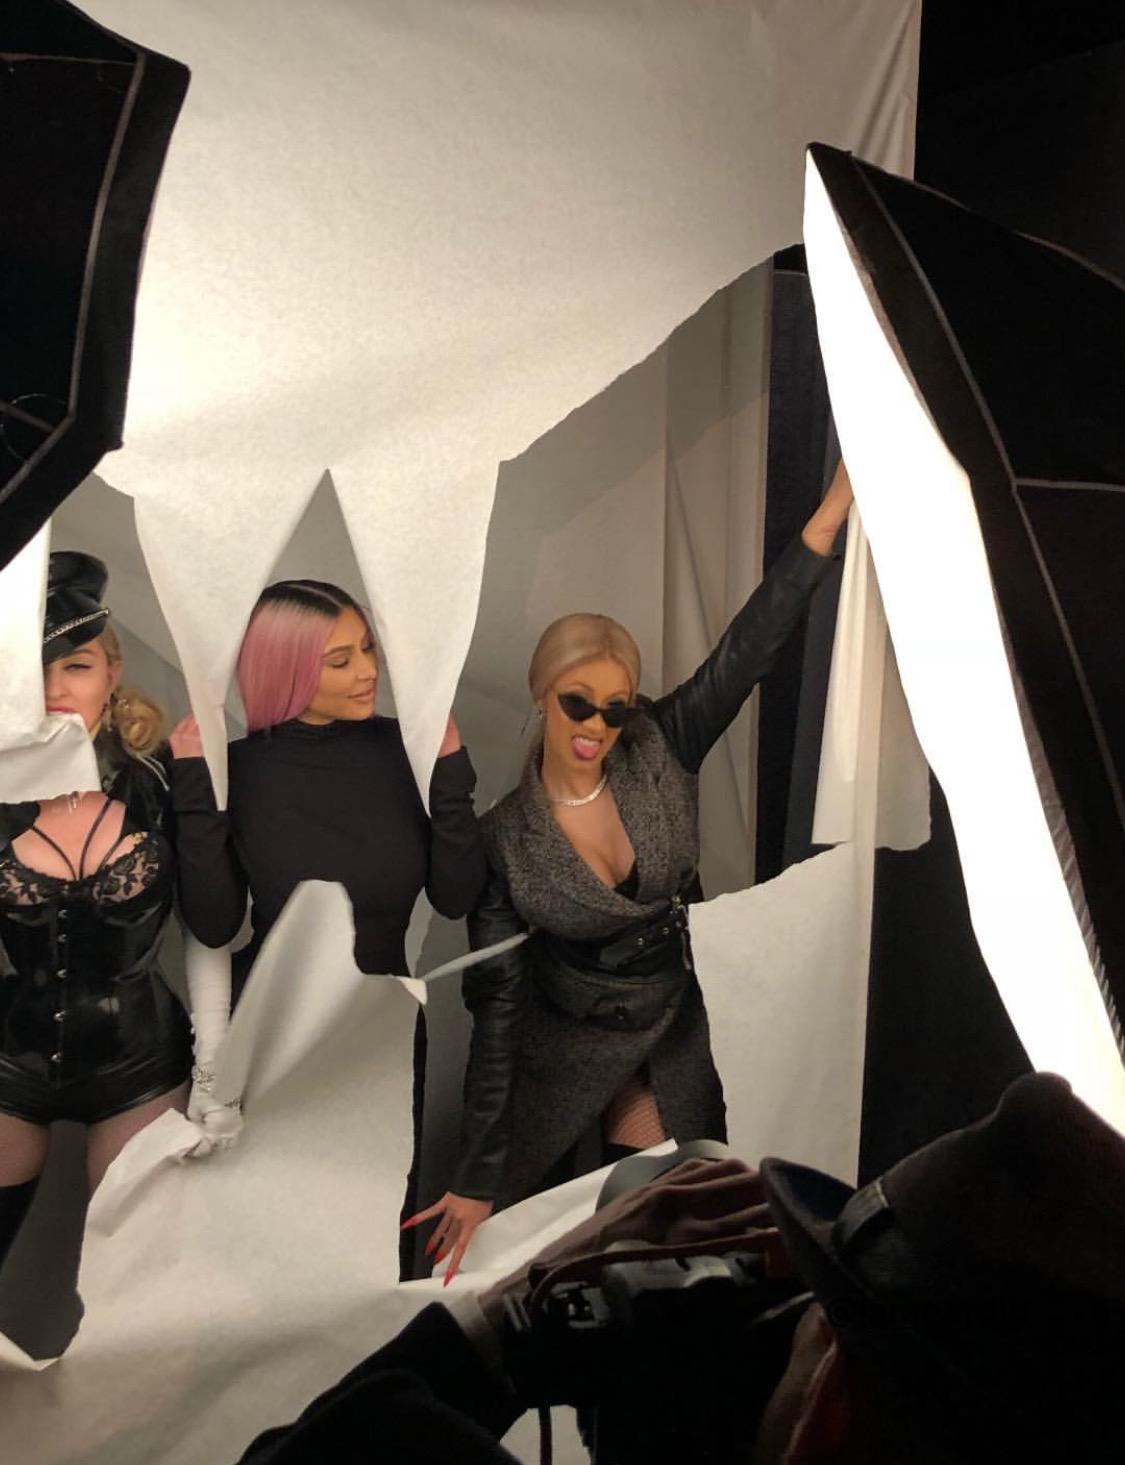 kim-kardashian-cardi-b-madonna-photoshoot-galore